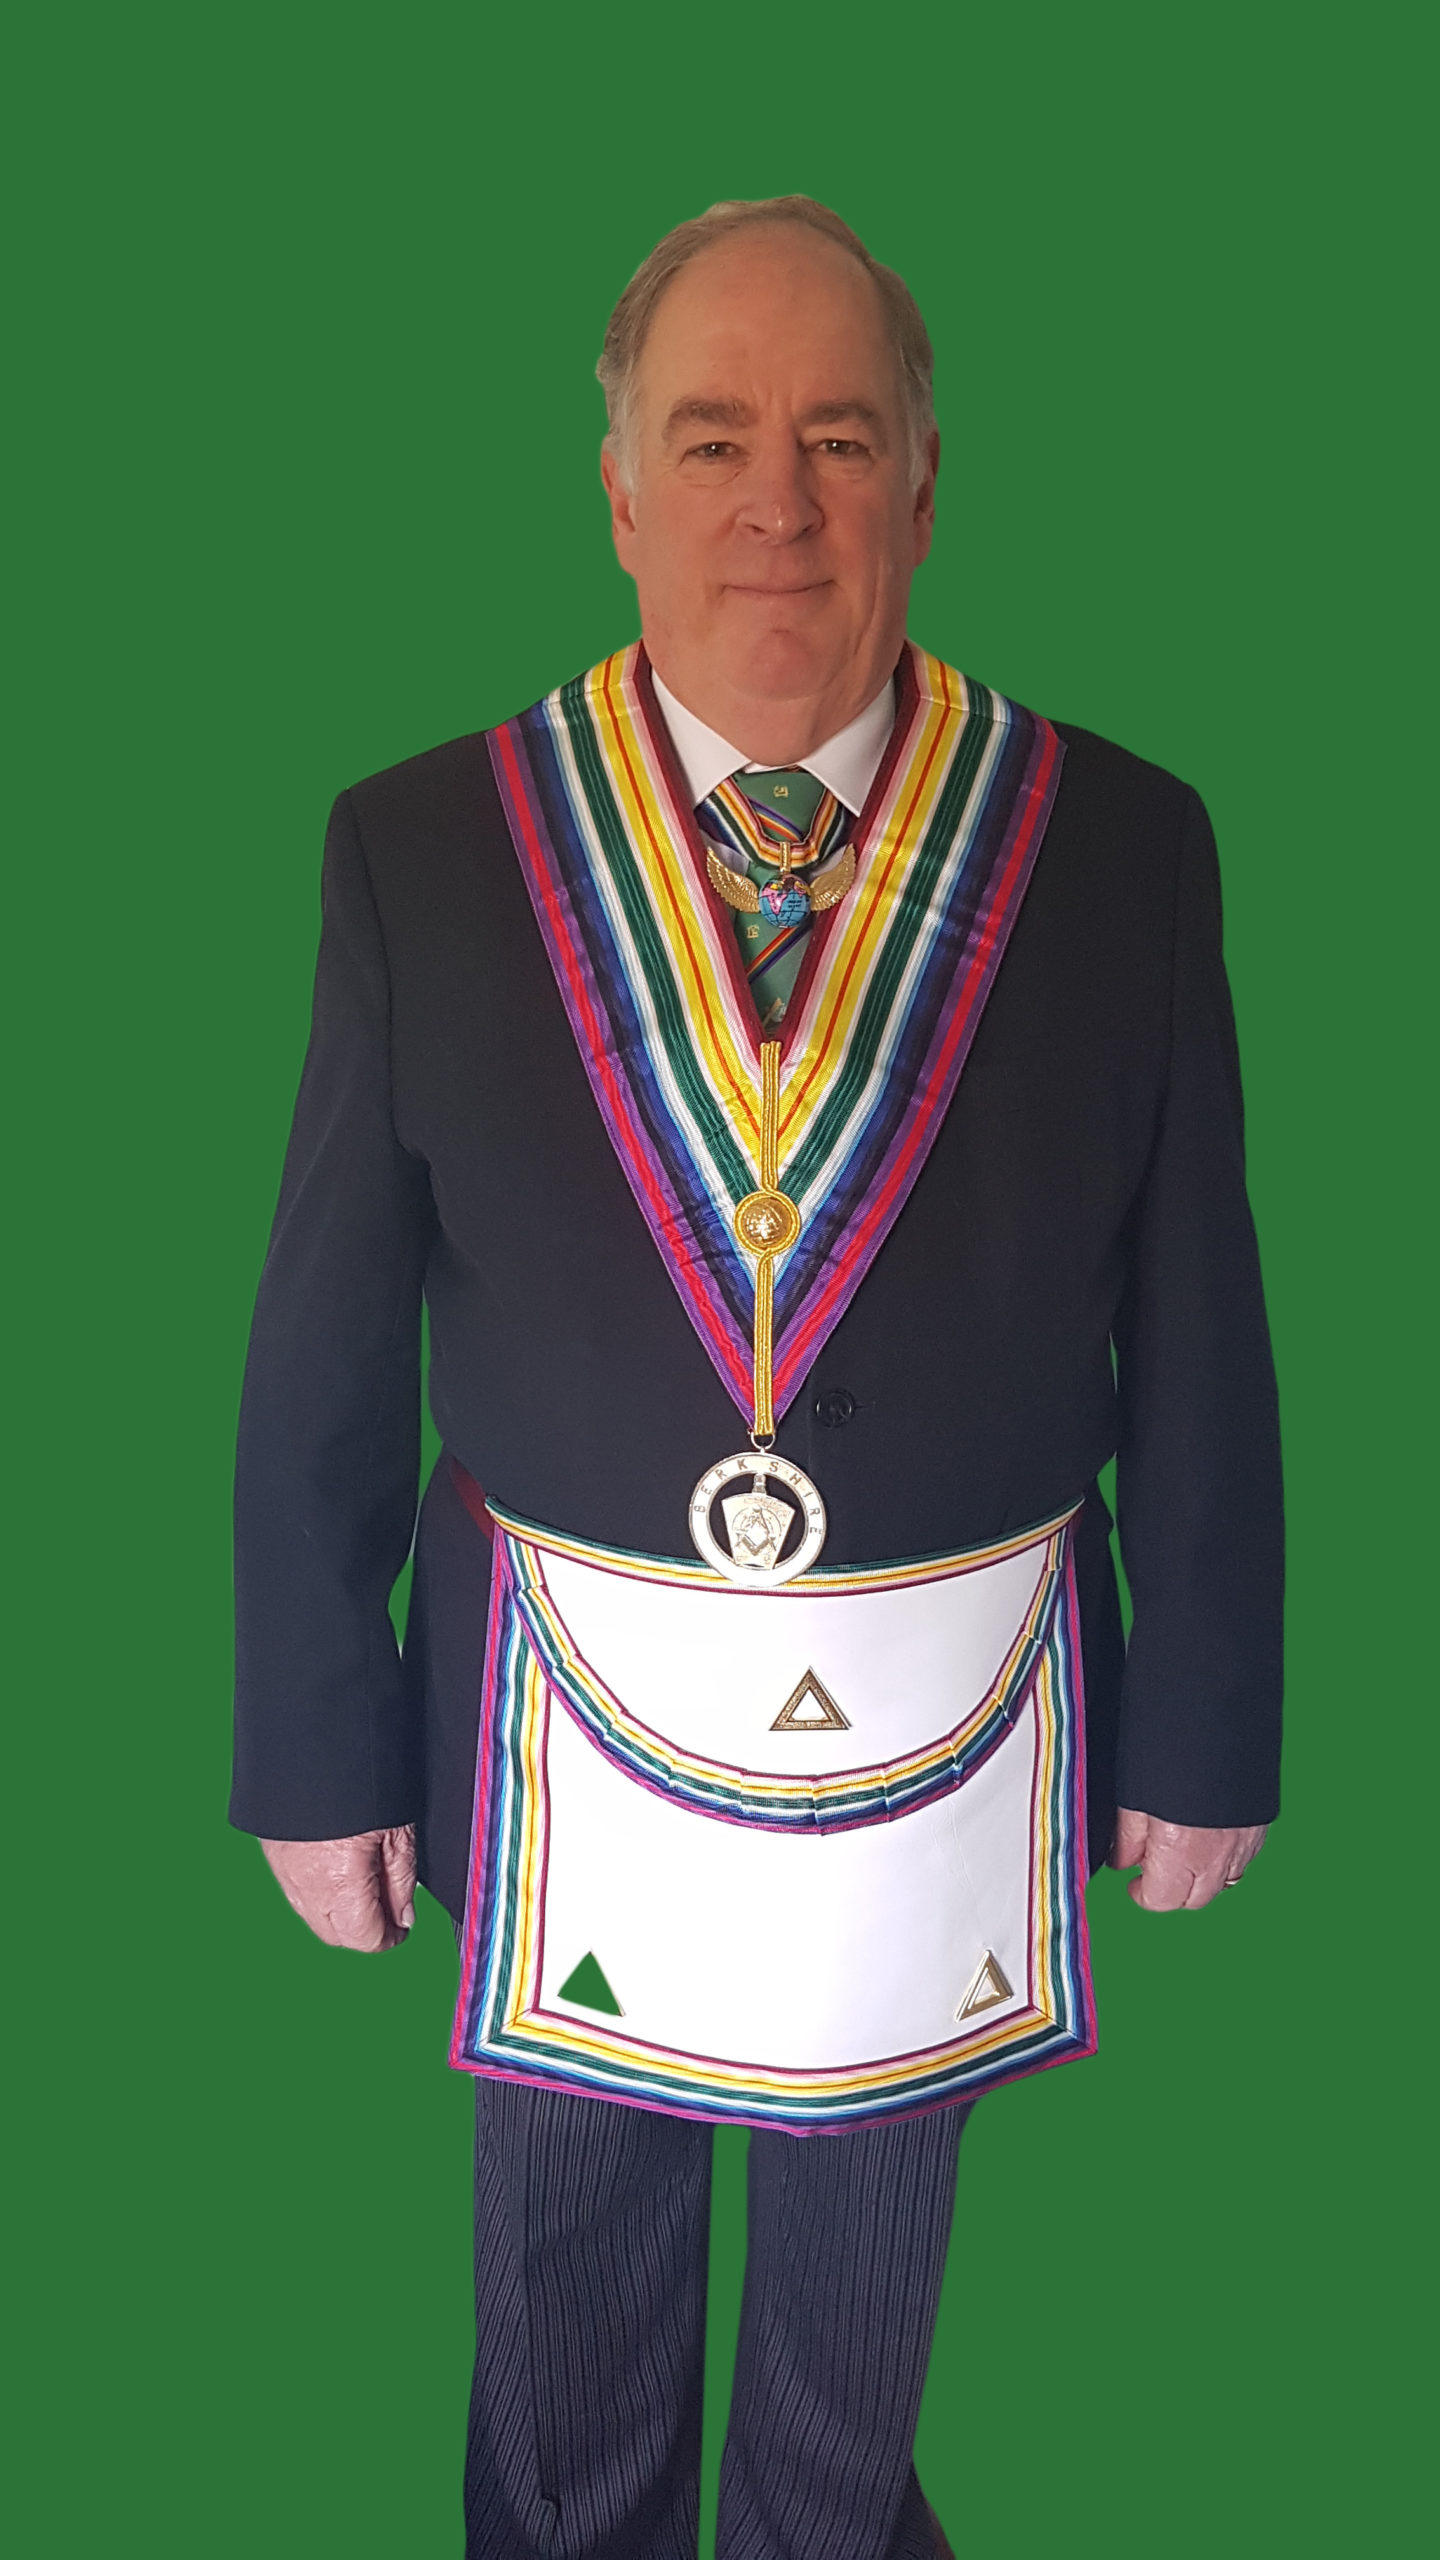 Provincial Grand Master R.W.Bro. Richard J Olliver, G.M.R.A.C.